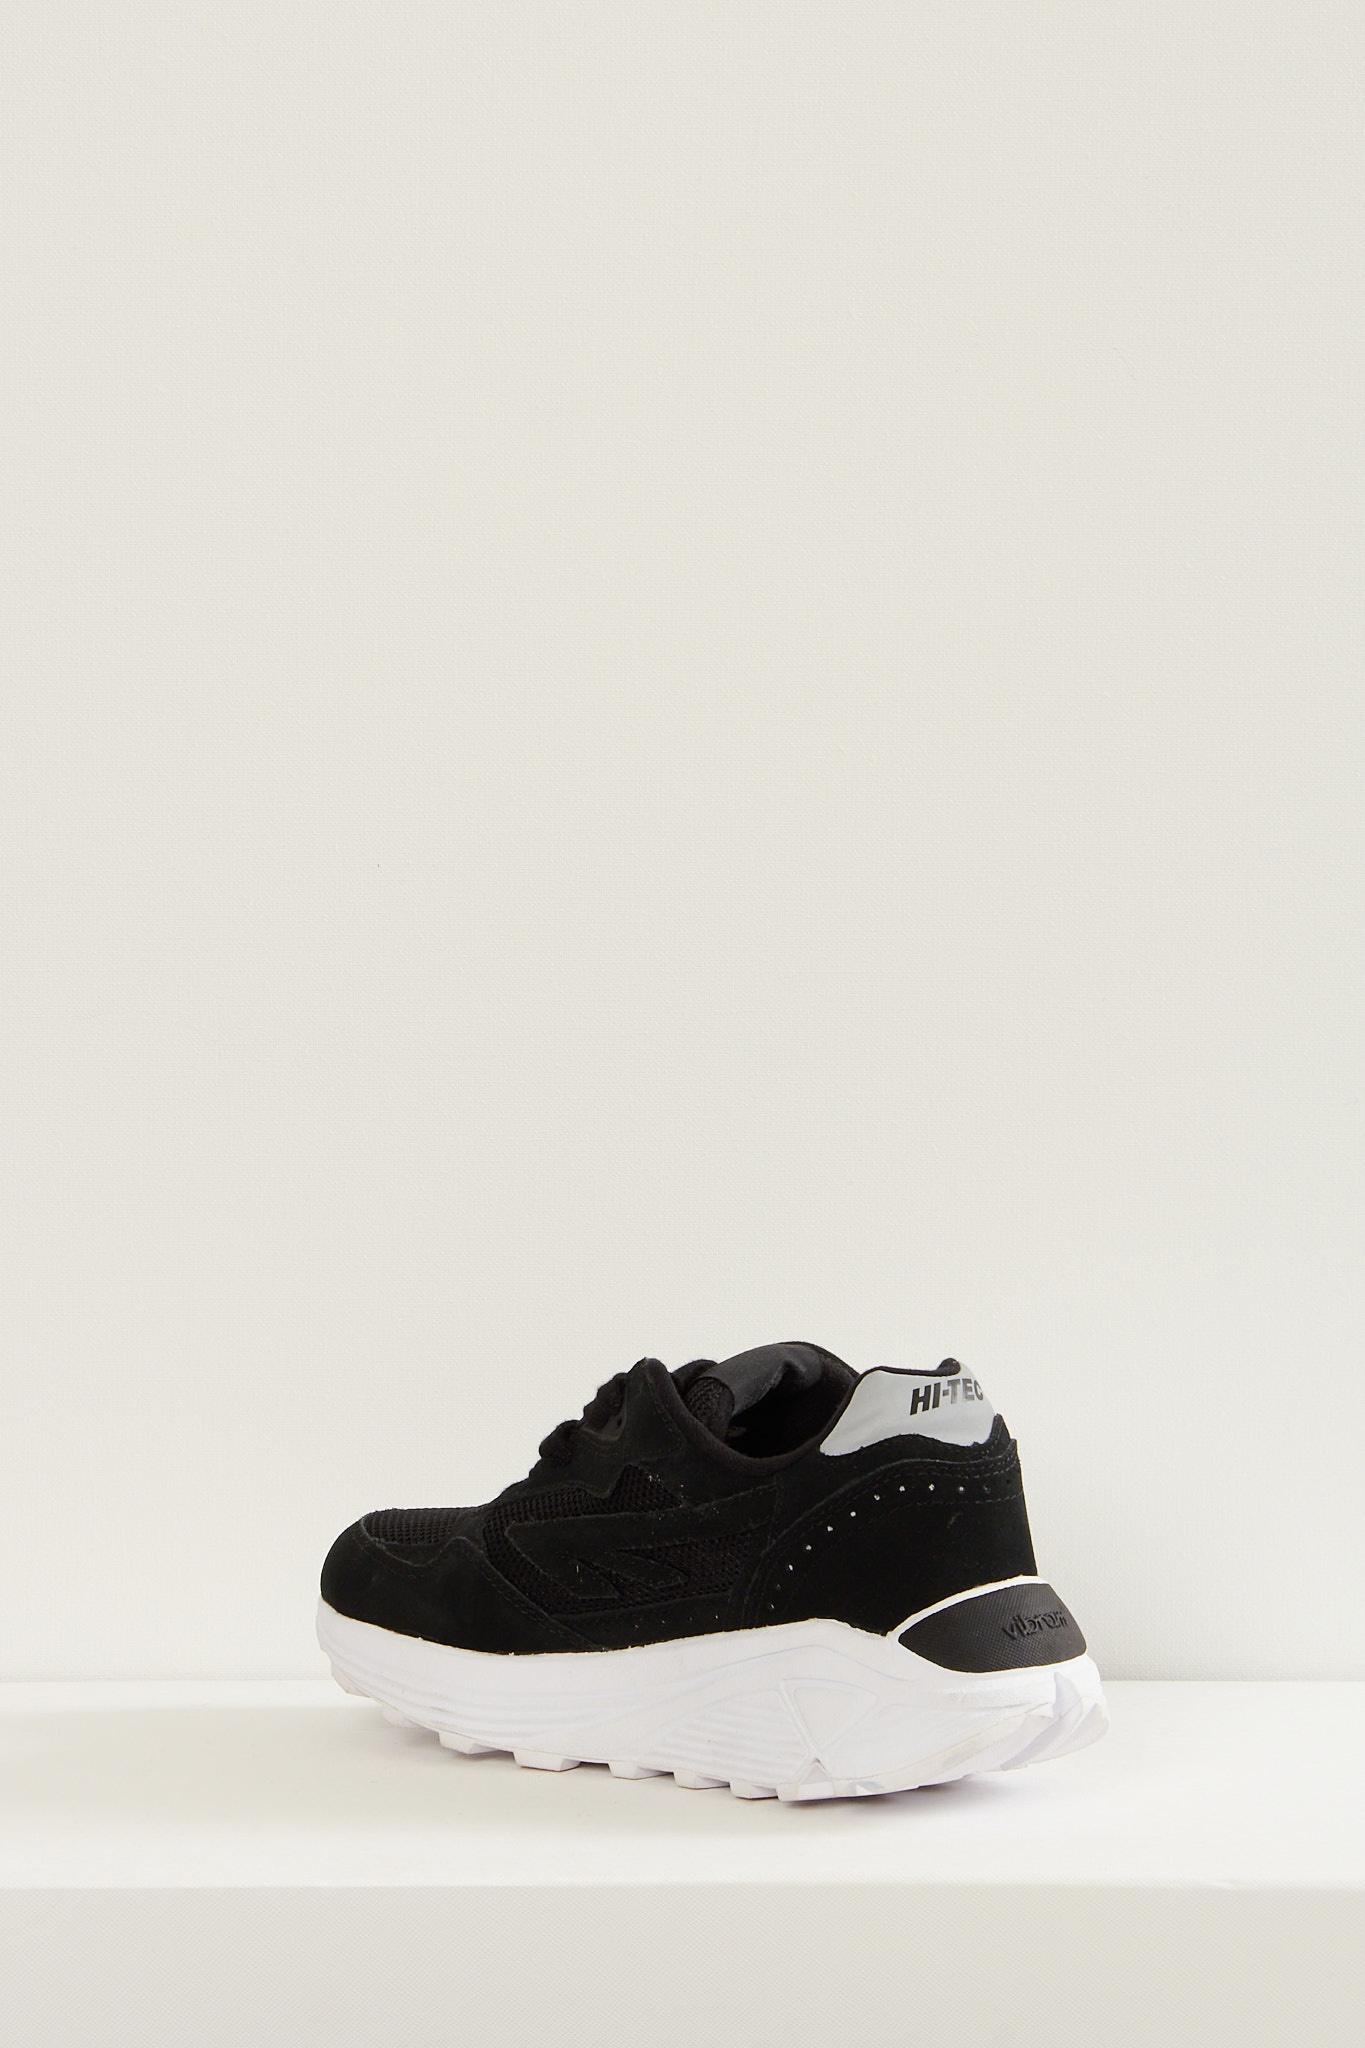 Hi-Tec - Hts silver shadow sneakers